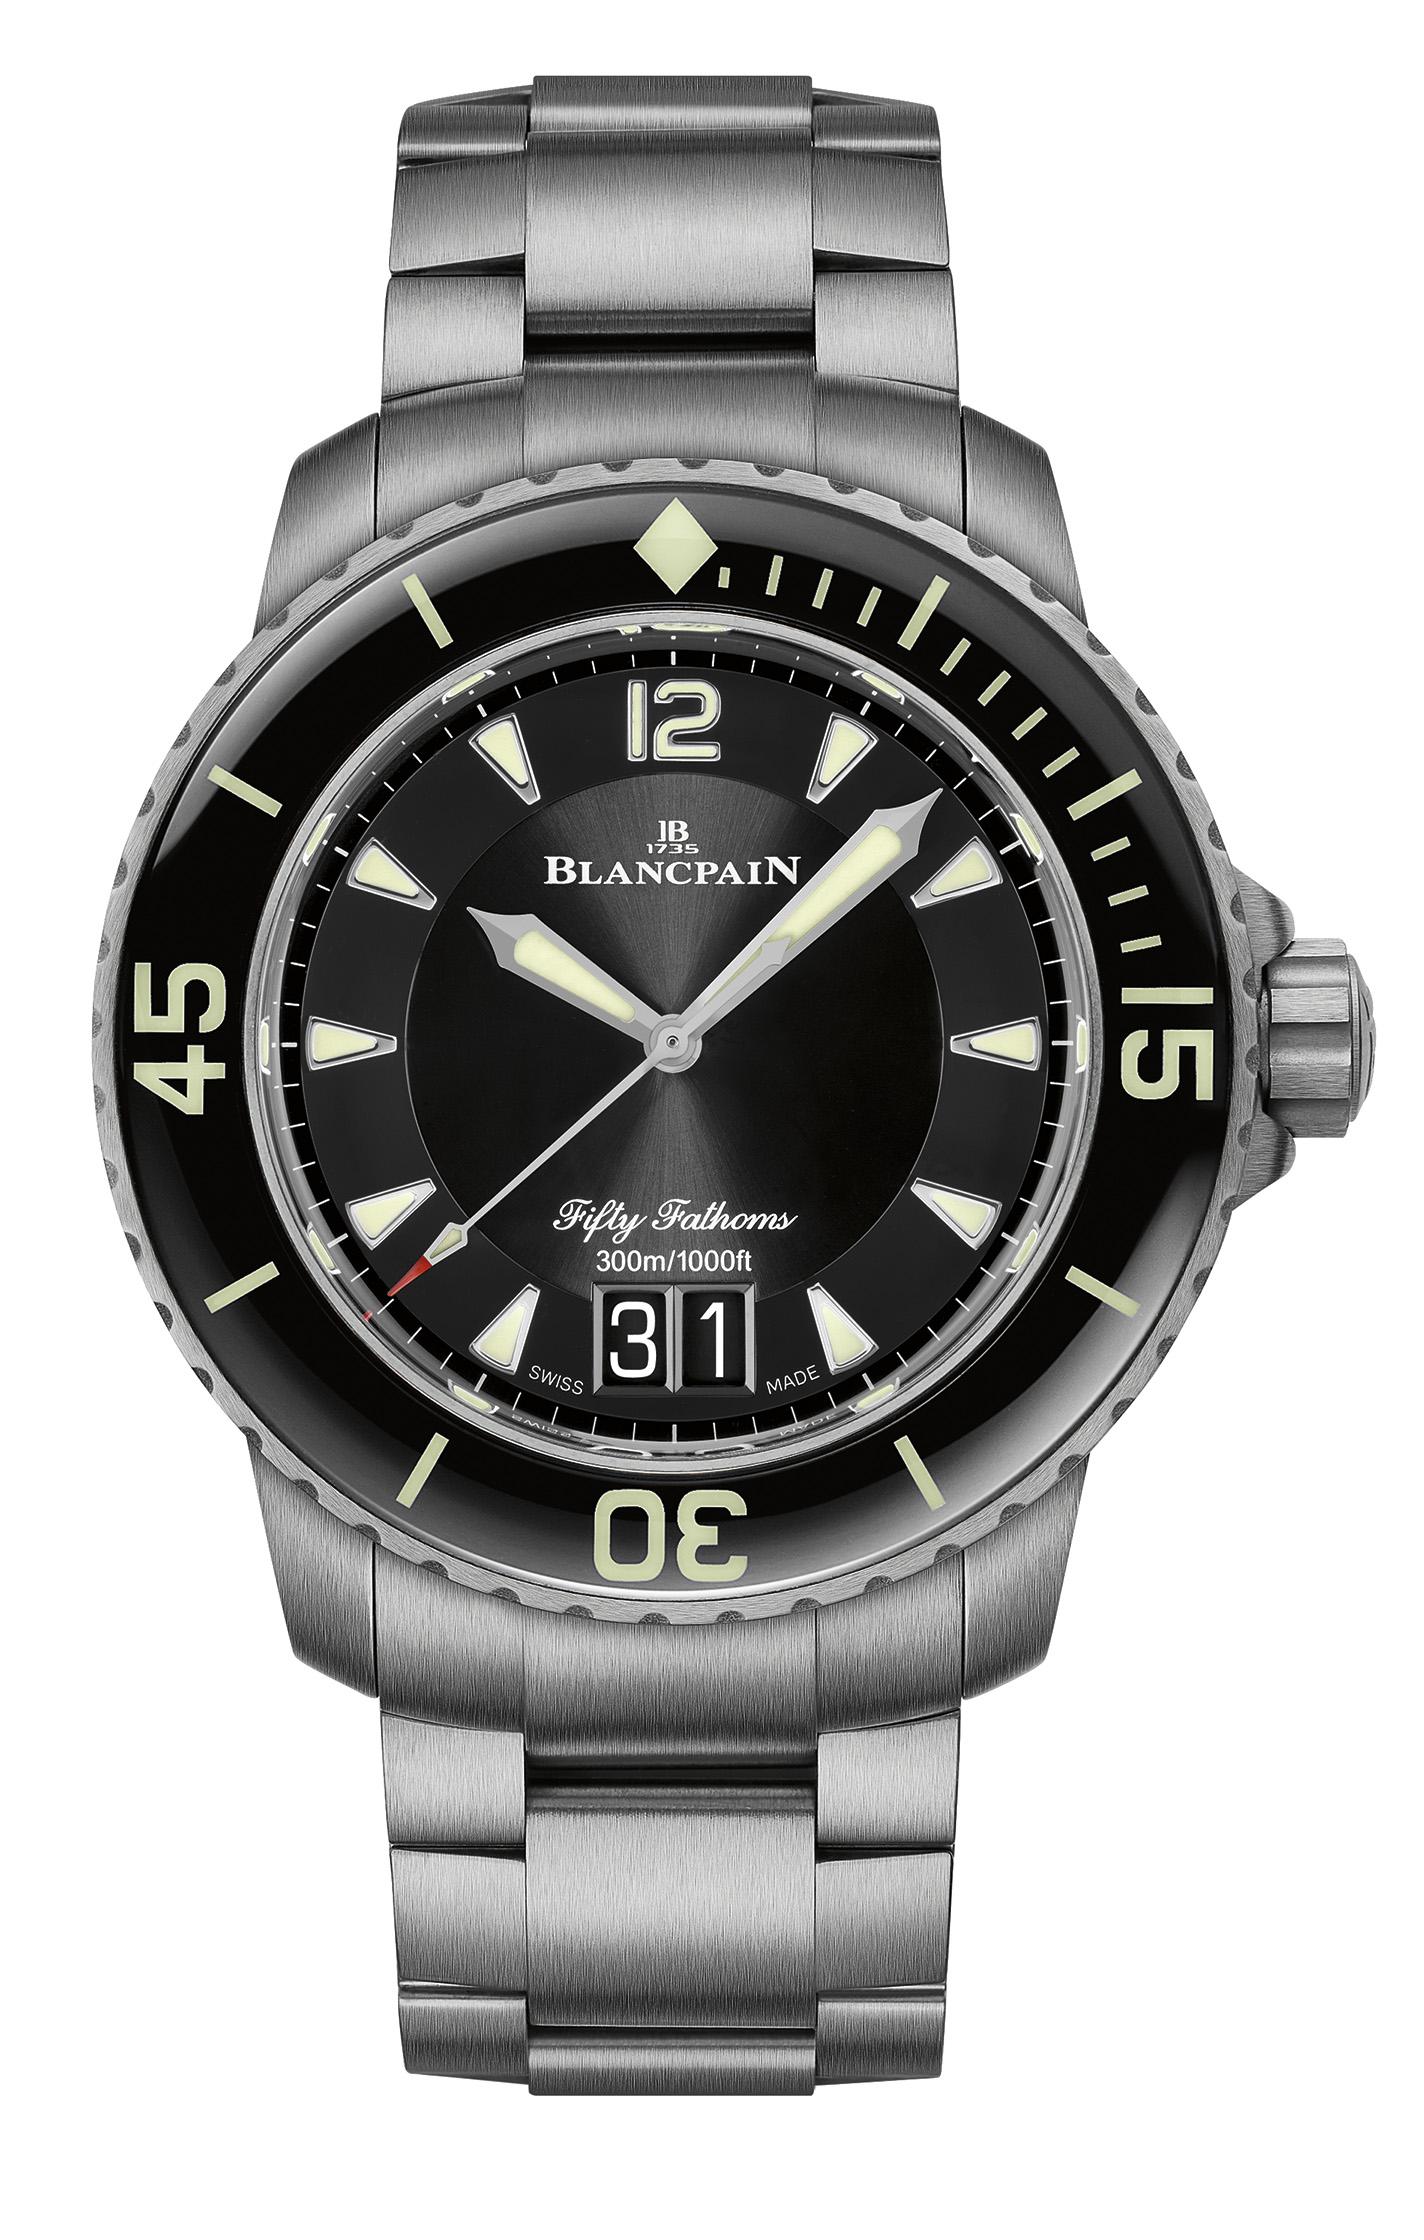 Blancpain Fifty Fathoms titanio